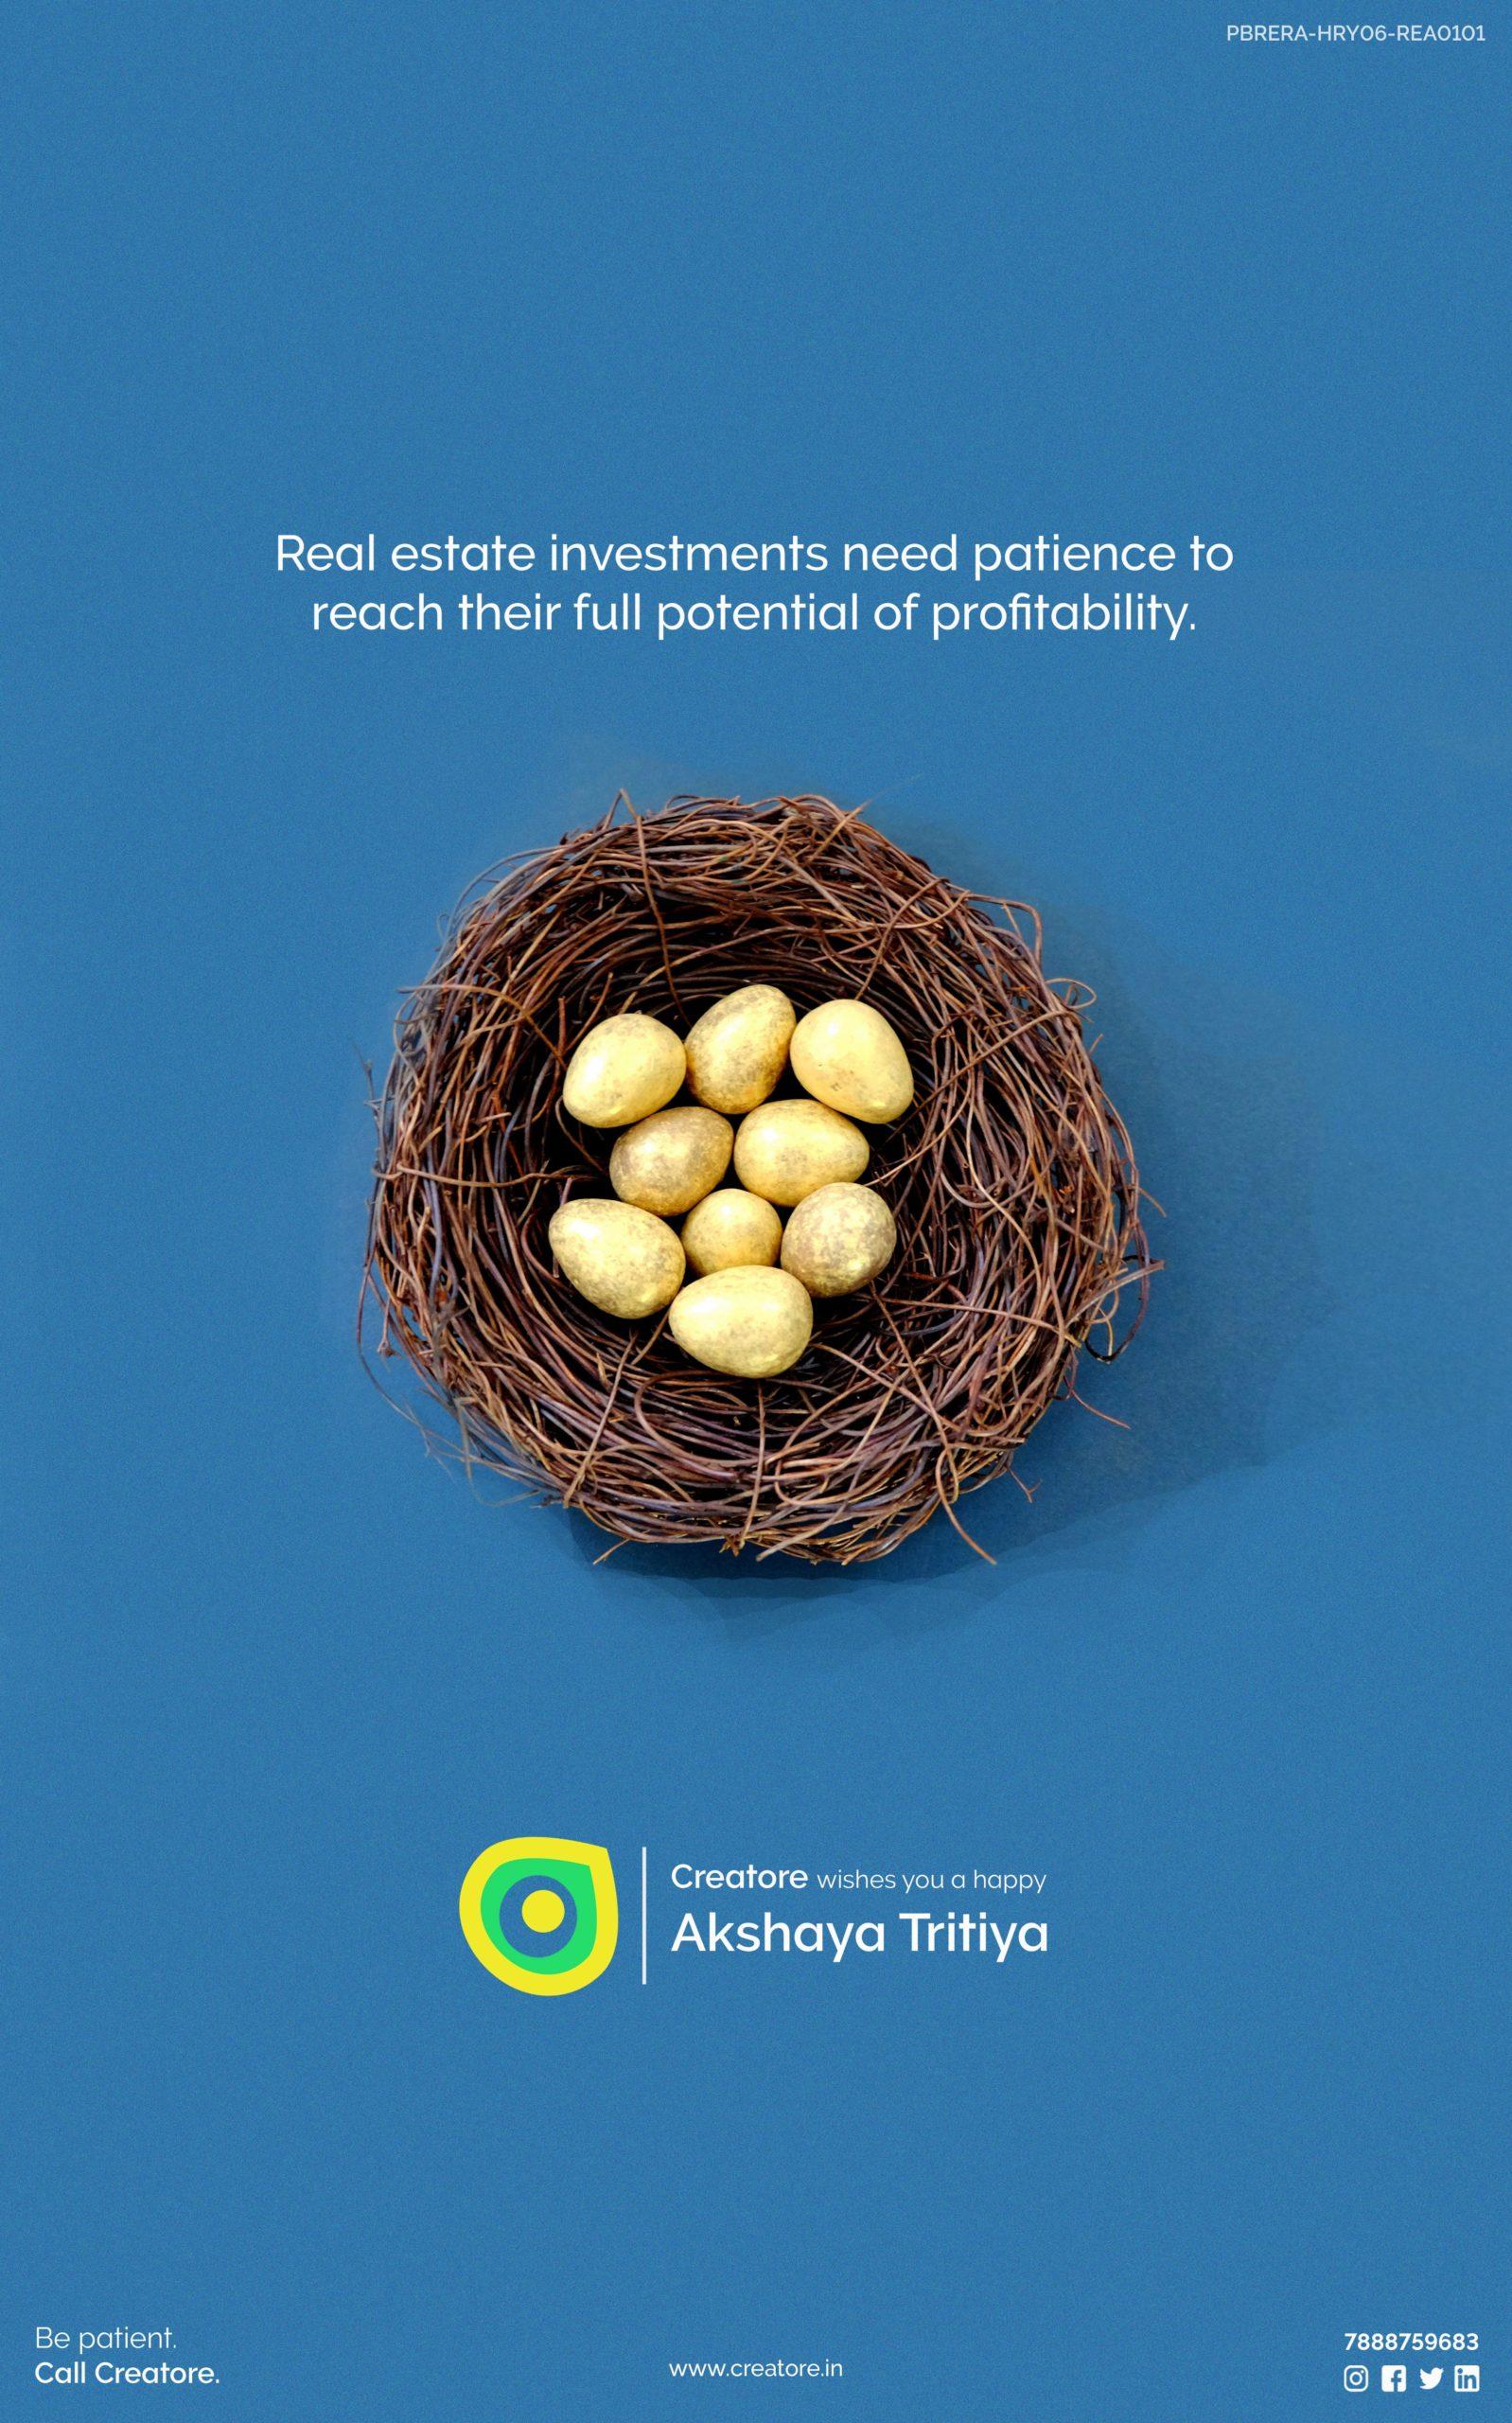 Creative Advertising and Marketing Agency Akshaya Tritya Corporate Greeting